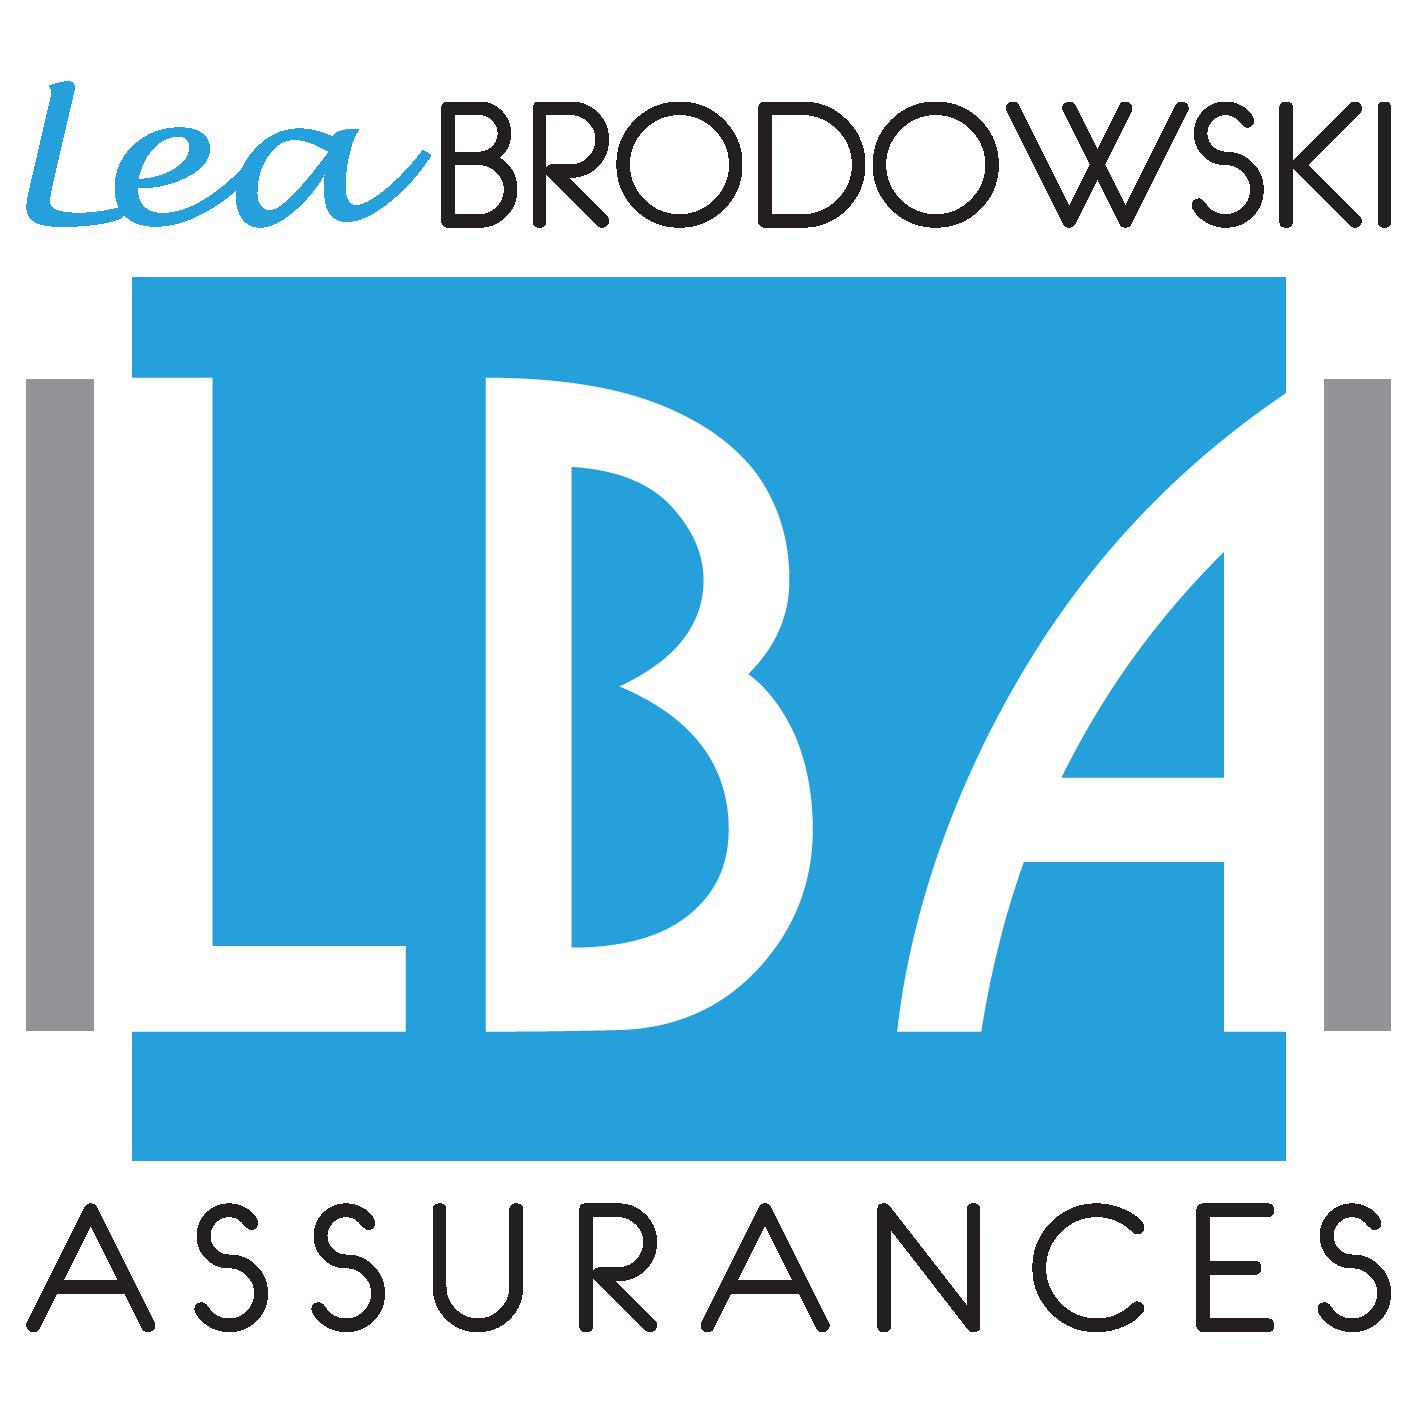 Lea Brodowski Assurances